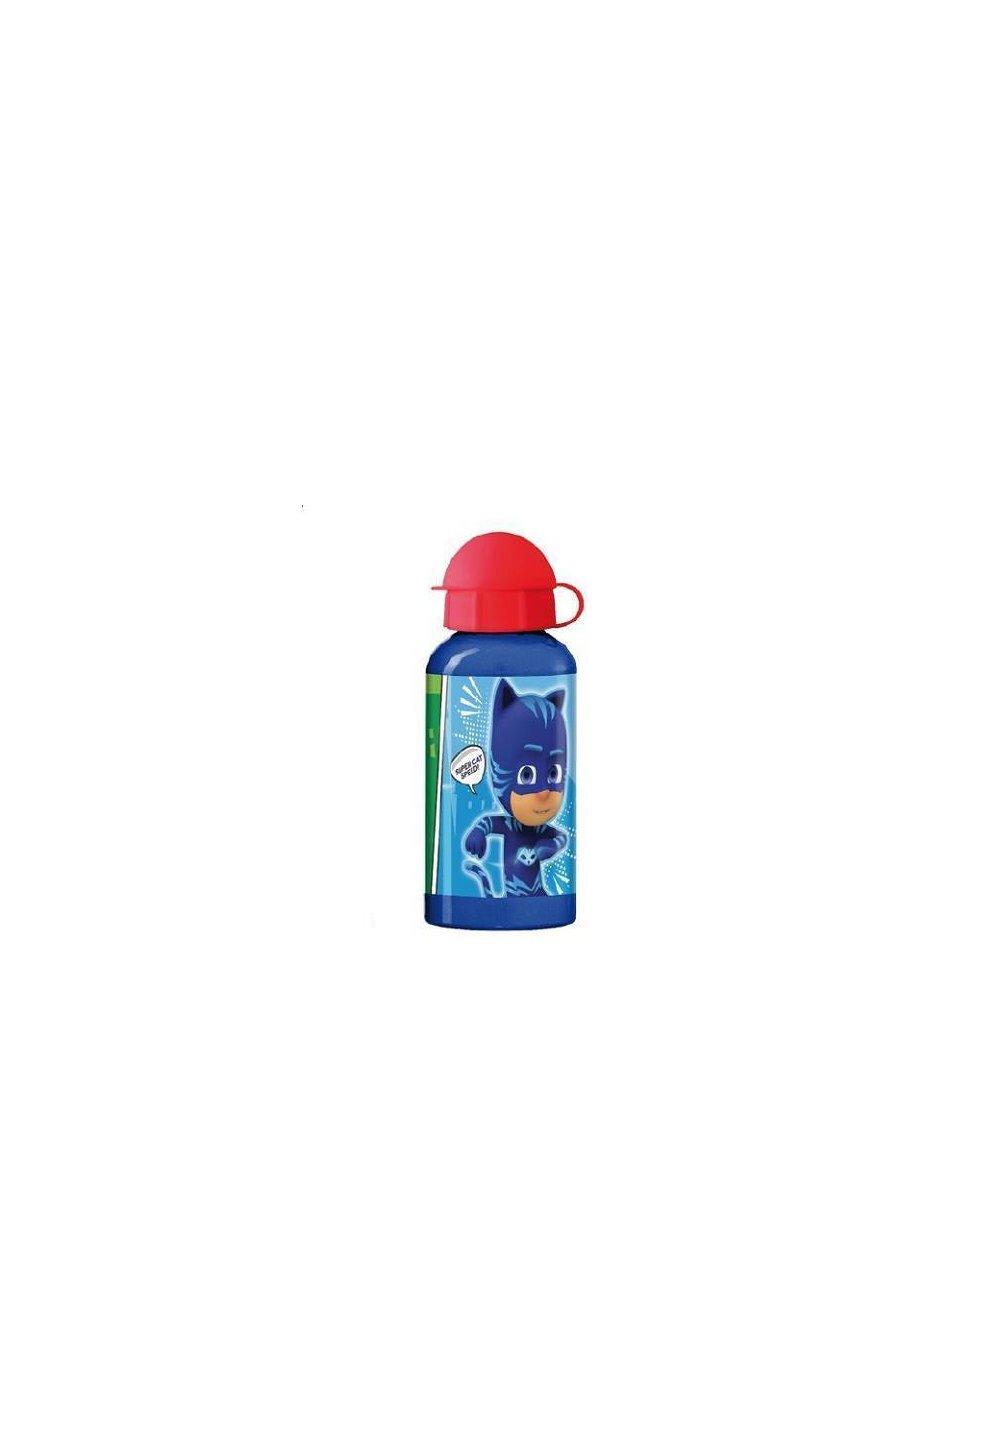 Sticla de aluminiu 400 ml, Eroii in Pijama, albastra imagine